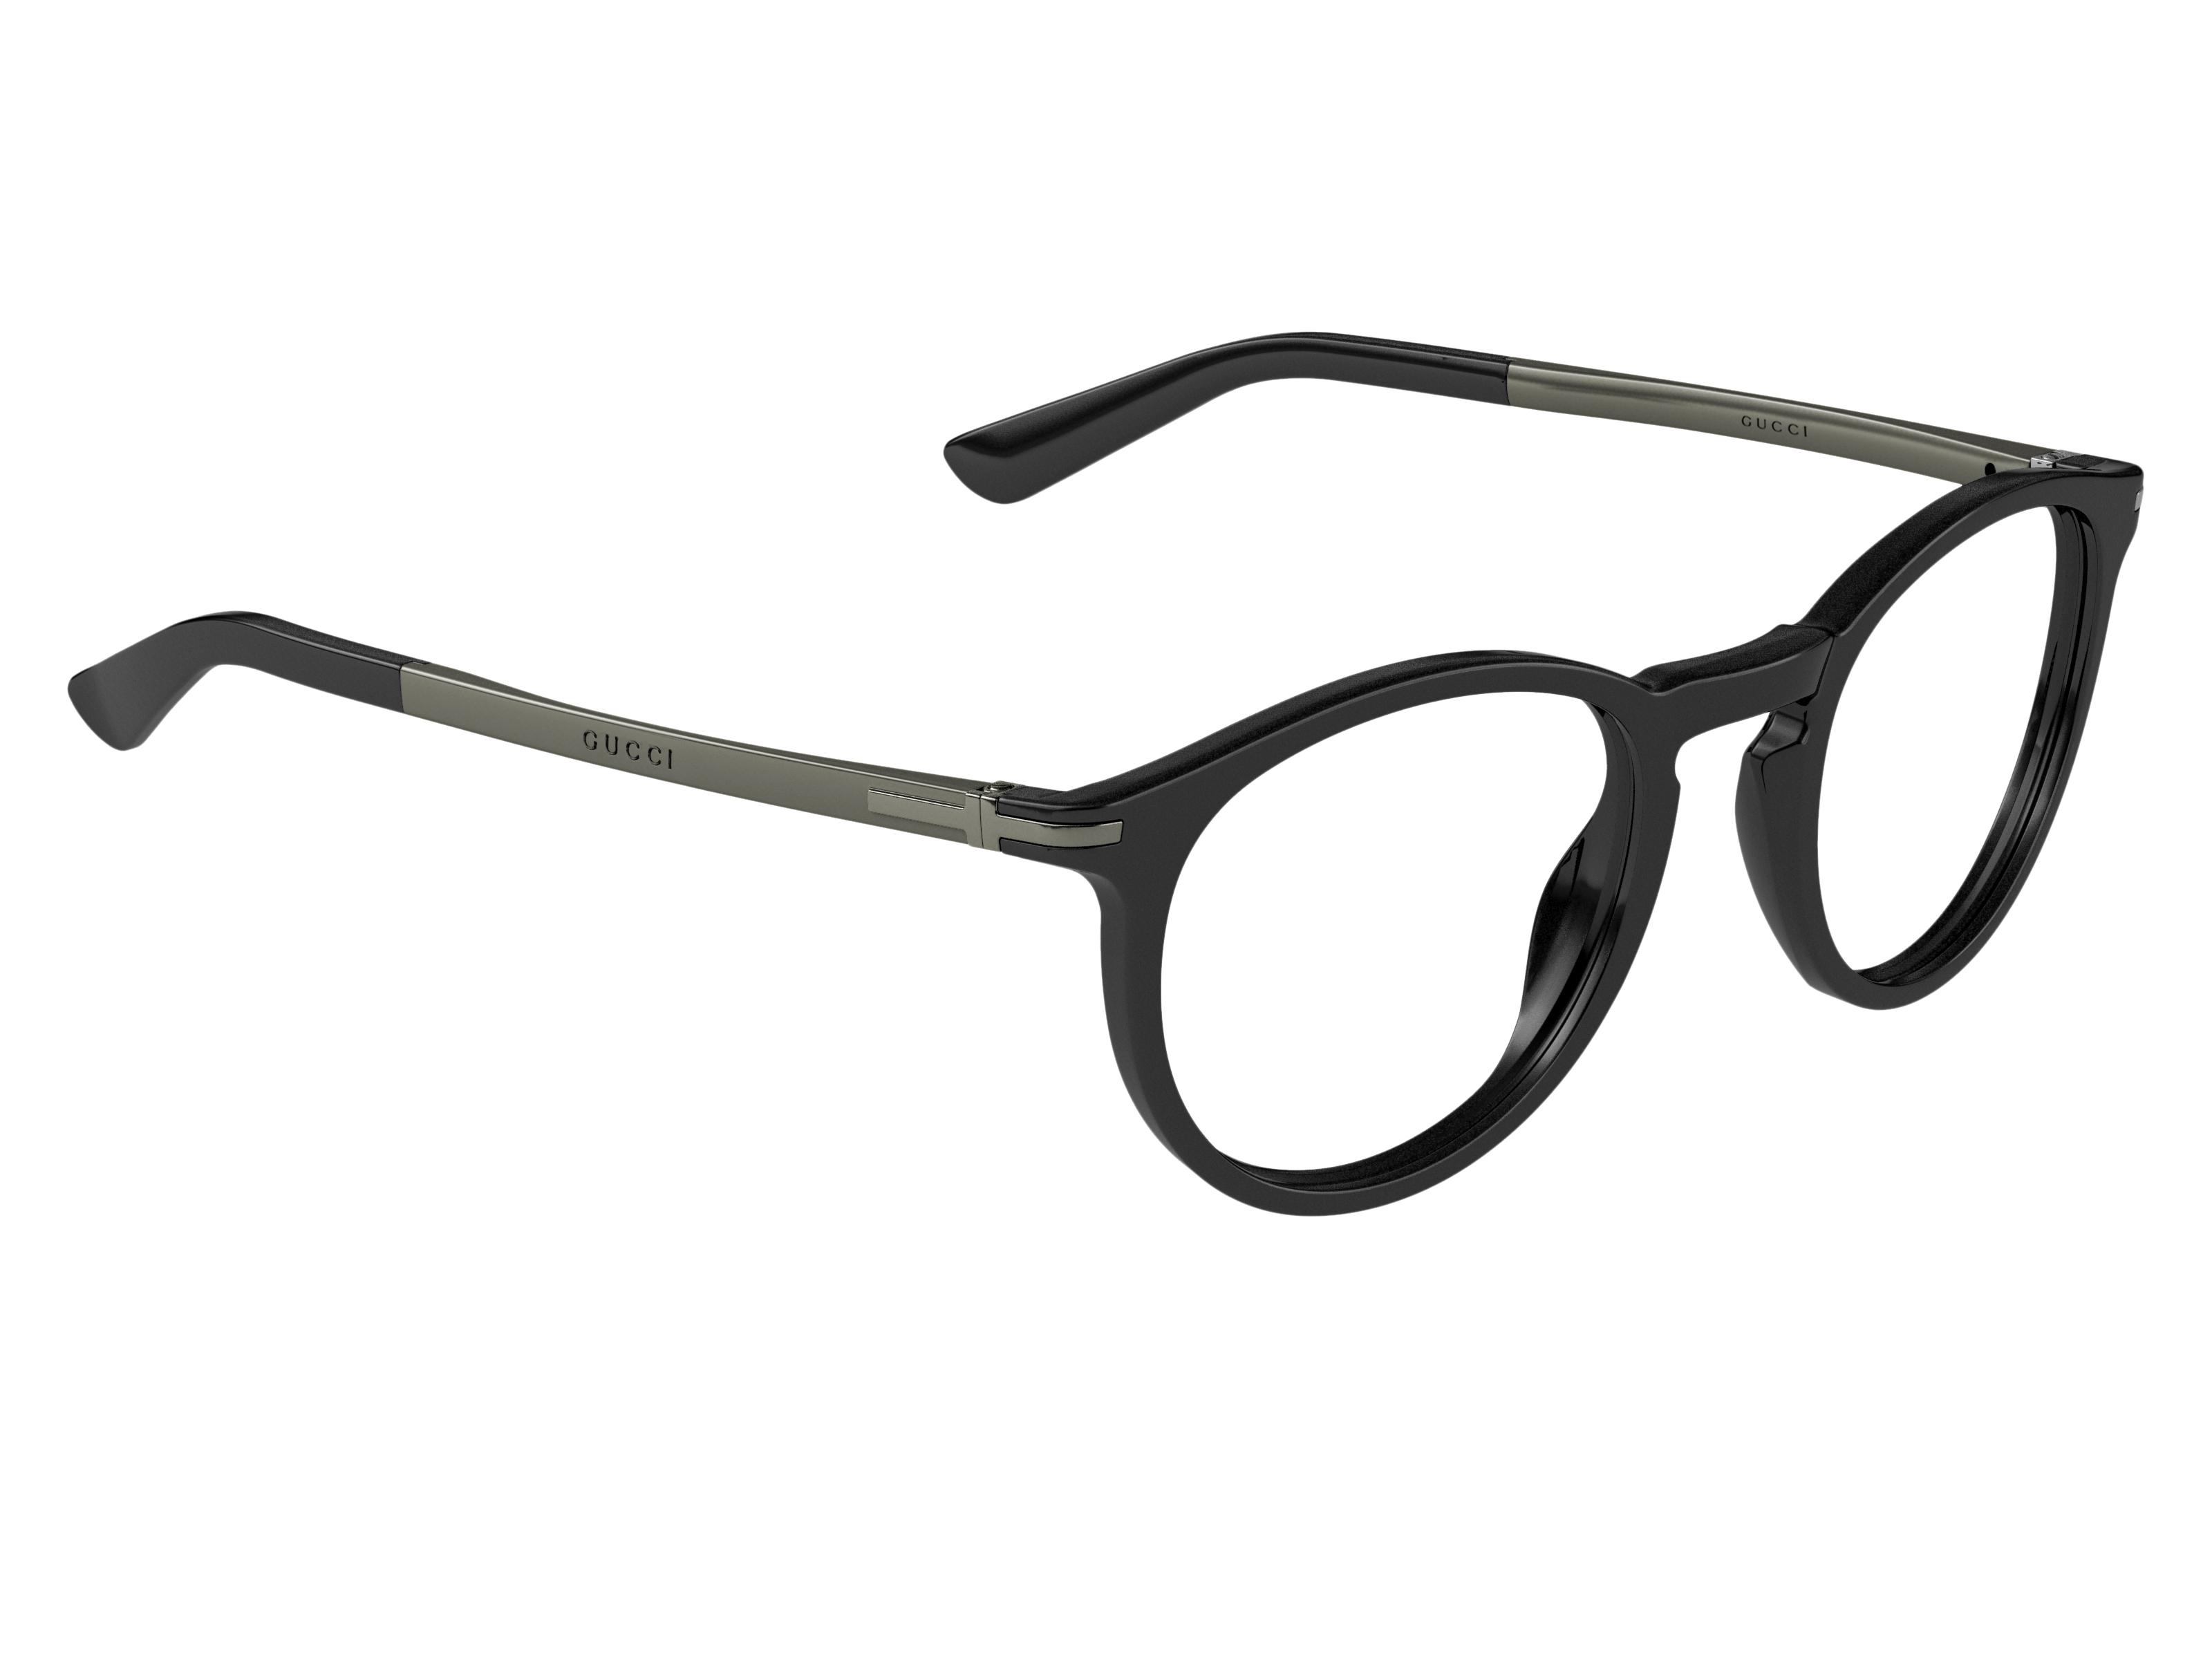 GG 1111-B2X 2 bd8a7. Τα ανδρικά στρογγυλά γυαλιά ηλίου και οράσεως ... 31c52007d82